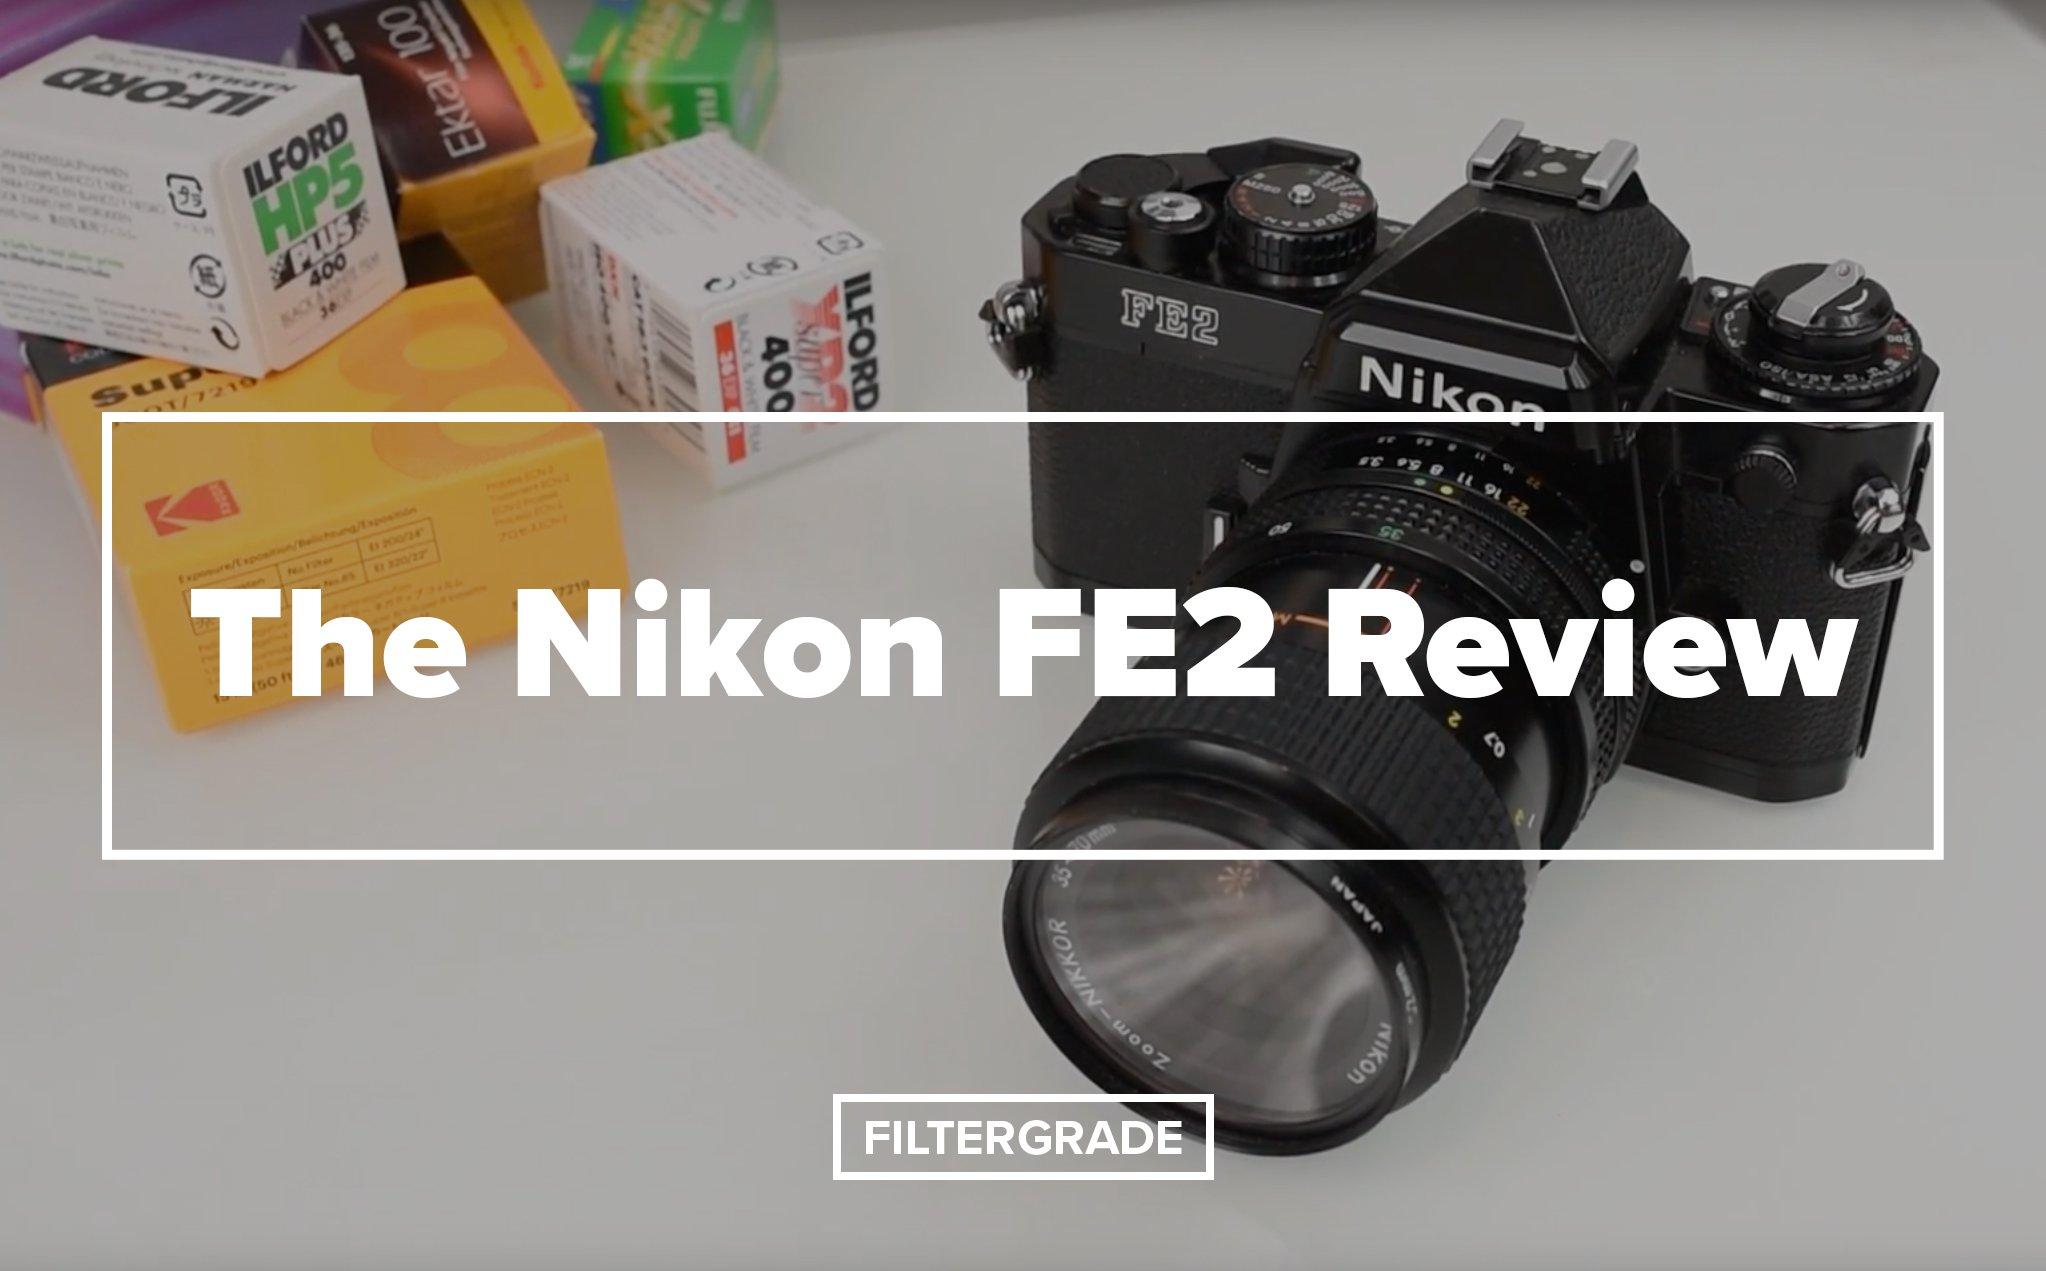 FG - The Nikon FE2 Review - FilterGrade